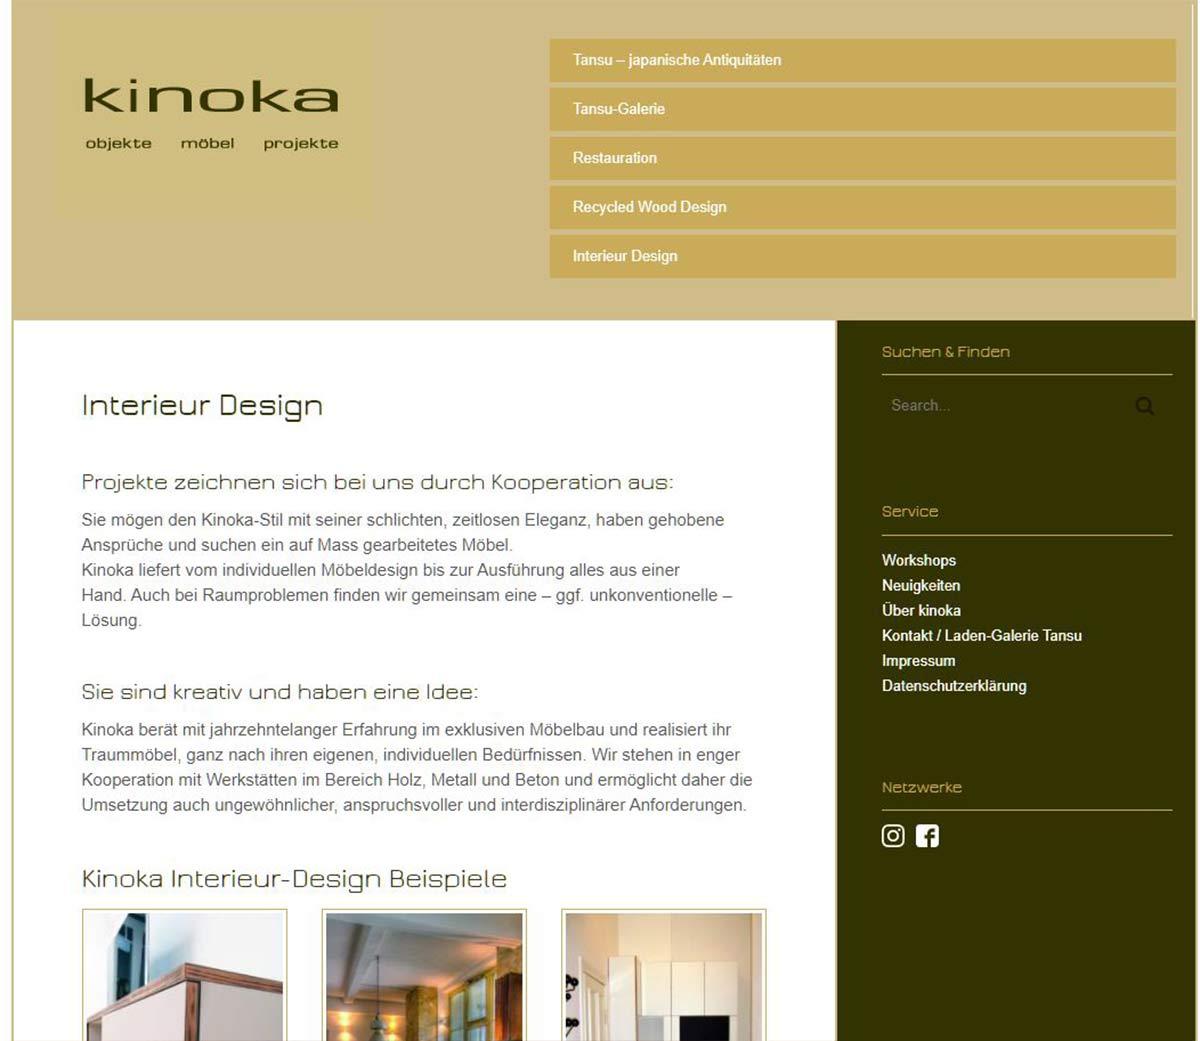 Kinoka Interieur Design